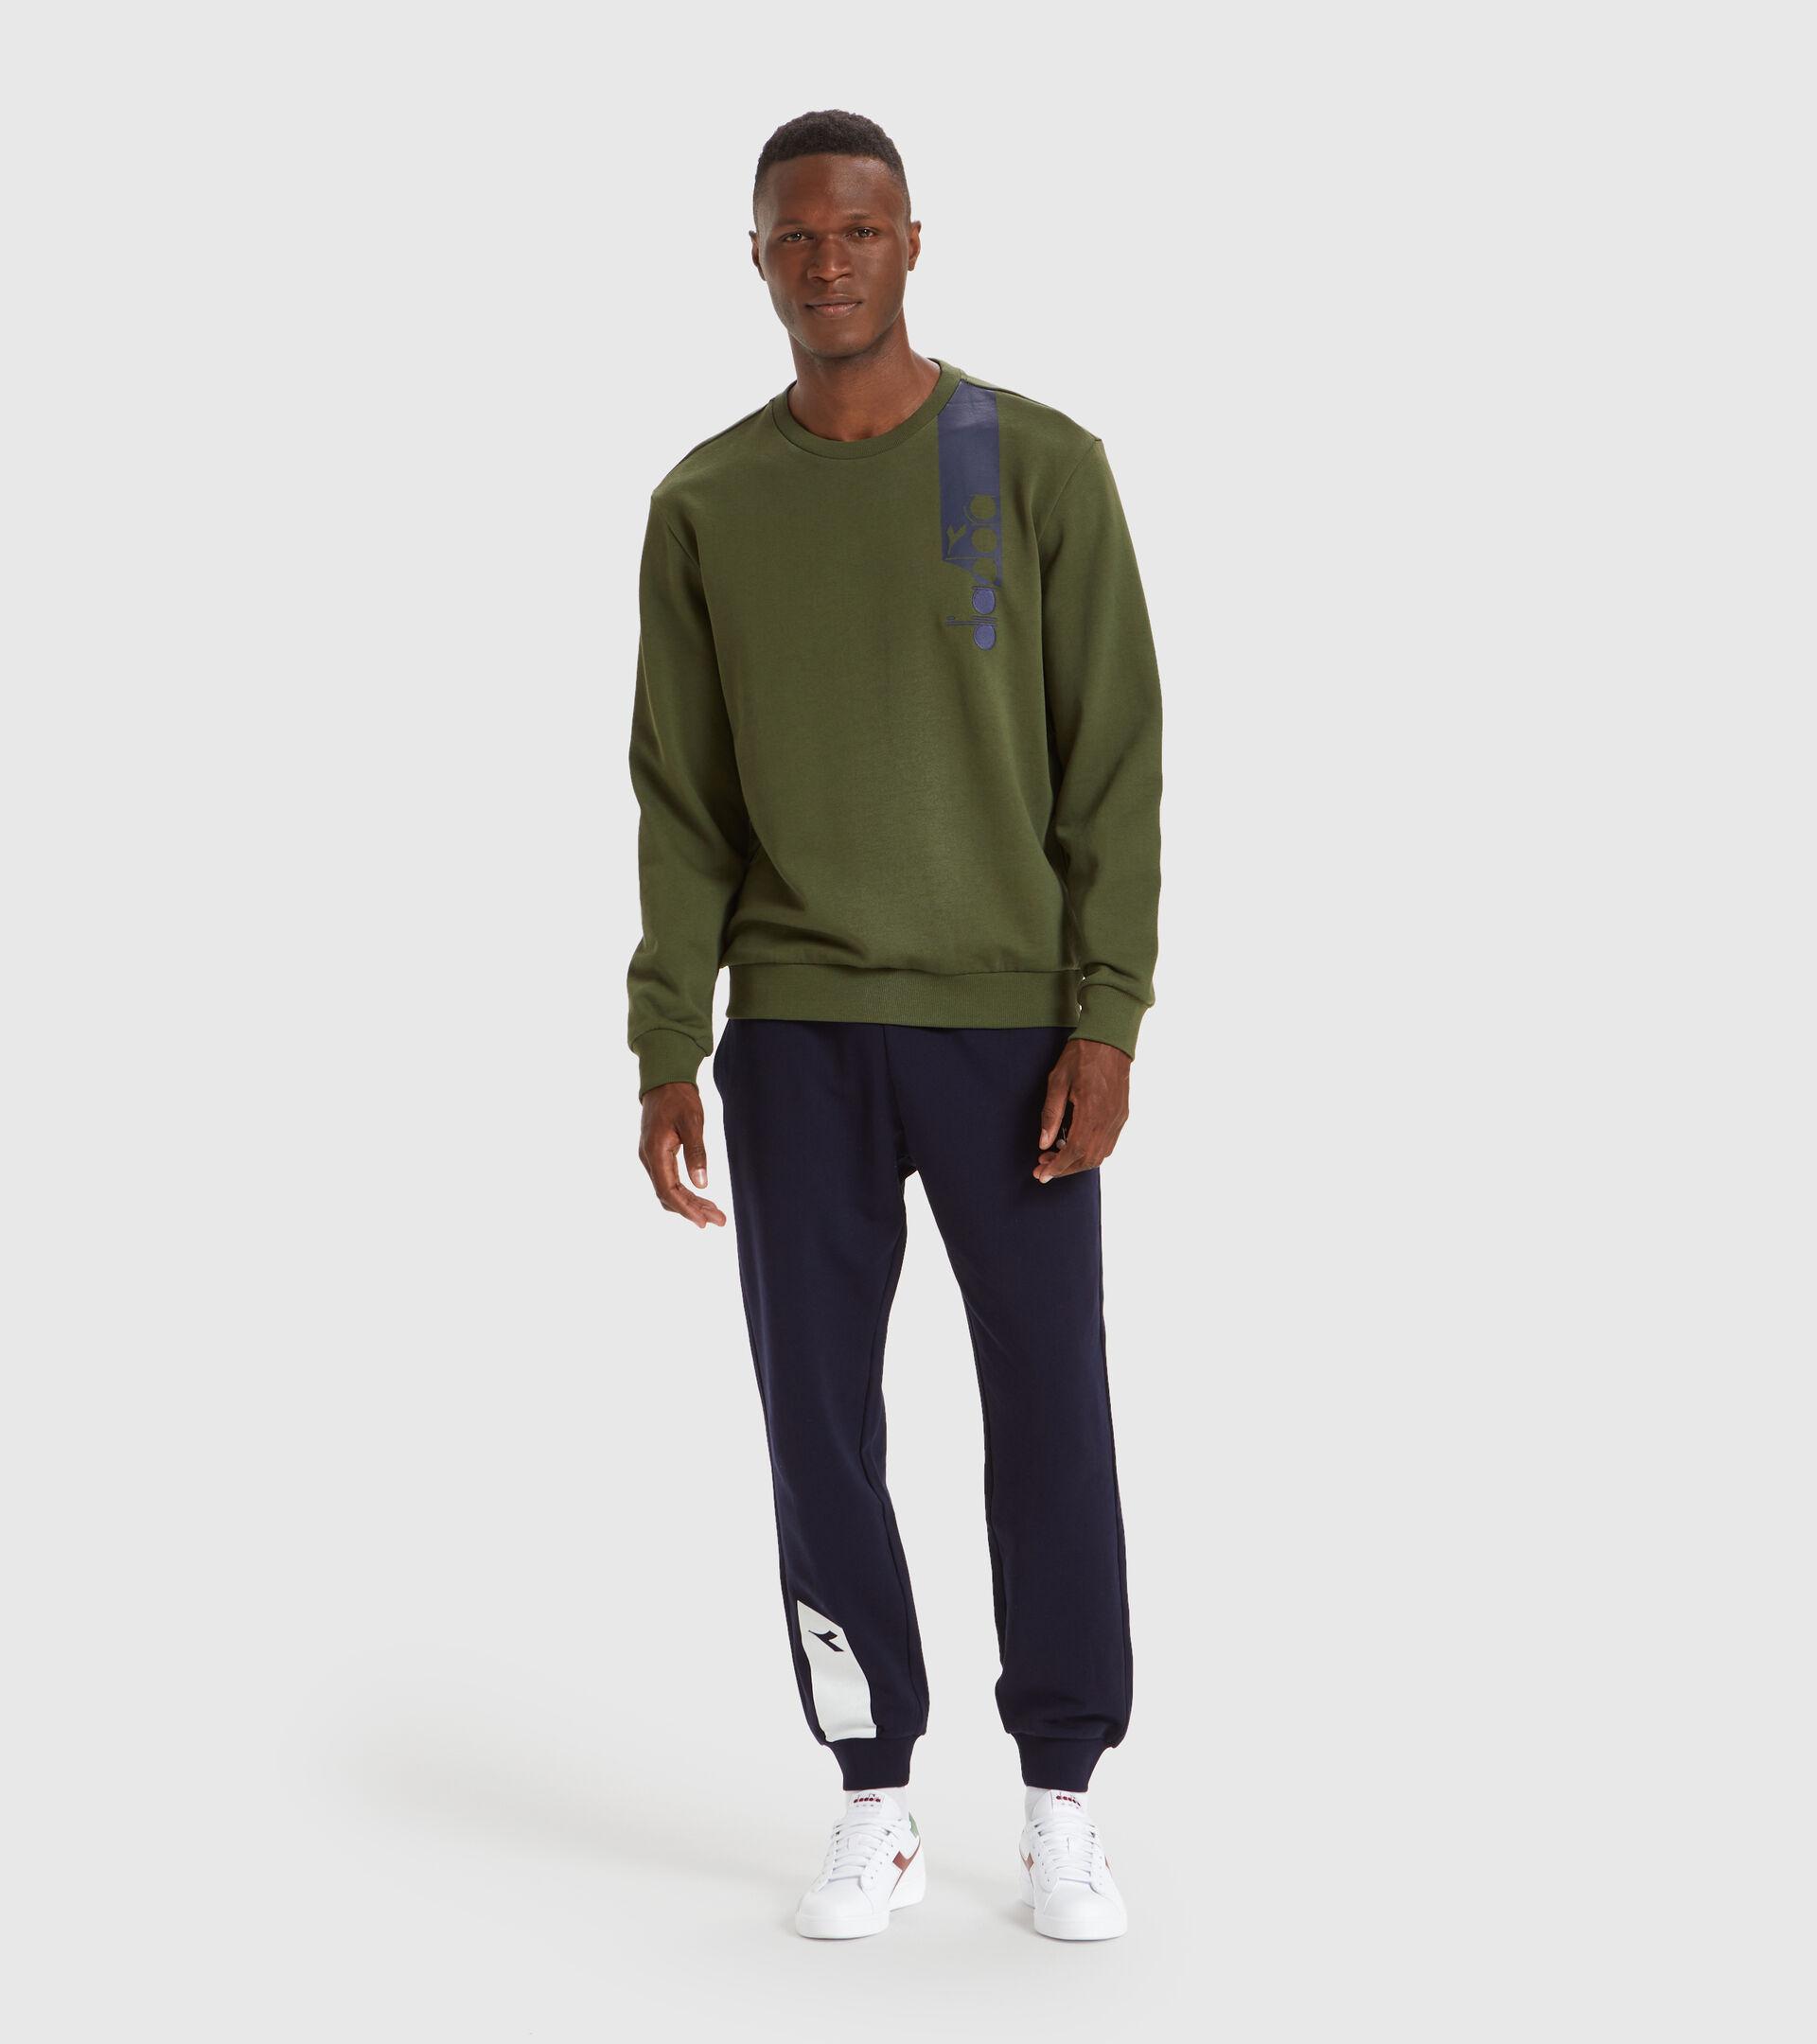 Apparel Sportswear UOMO SWEATSHIRT CREW ICON CYPRESS GREEN Diadora